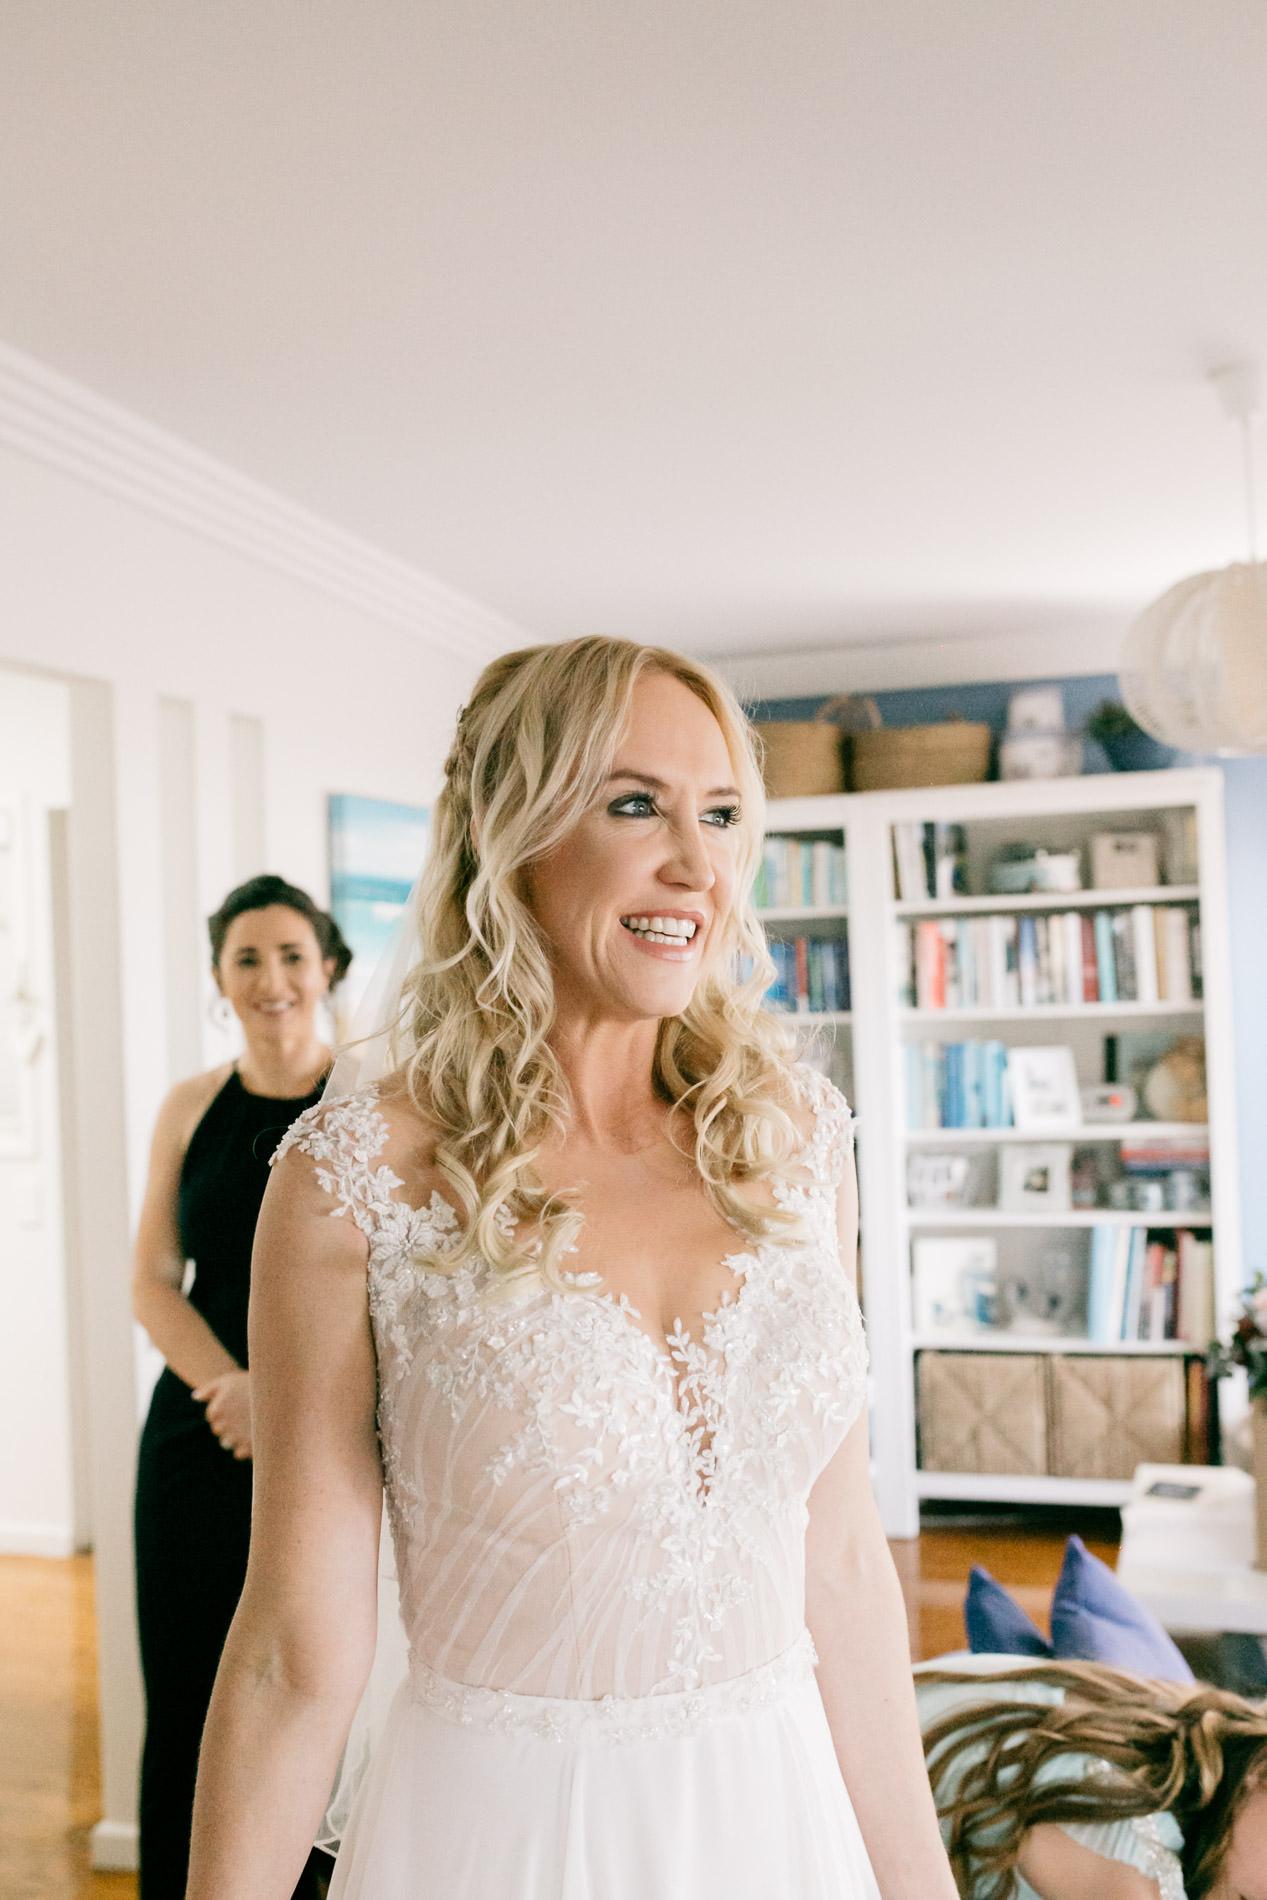 True North Photography_Boomerang Farm_Stacey and Isaac_Gold Coast Wedding_Barm Wedding_Hinterland Wedding-56.jpg